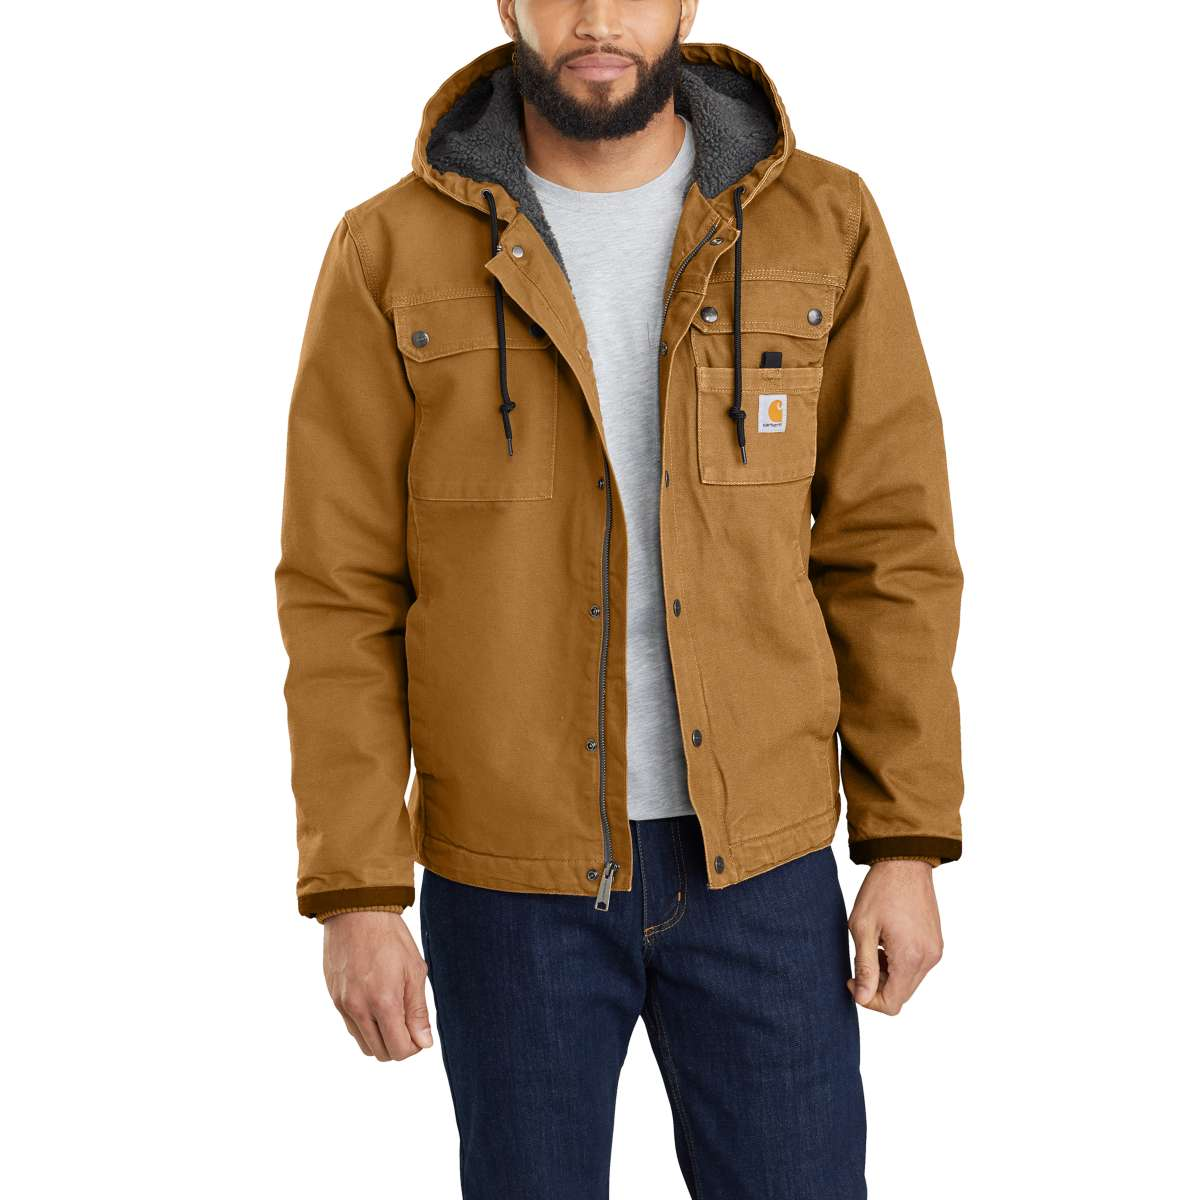 Carhartt Men's Bartlett Jacket, Extended Sizes - Brown, 3XL